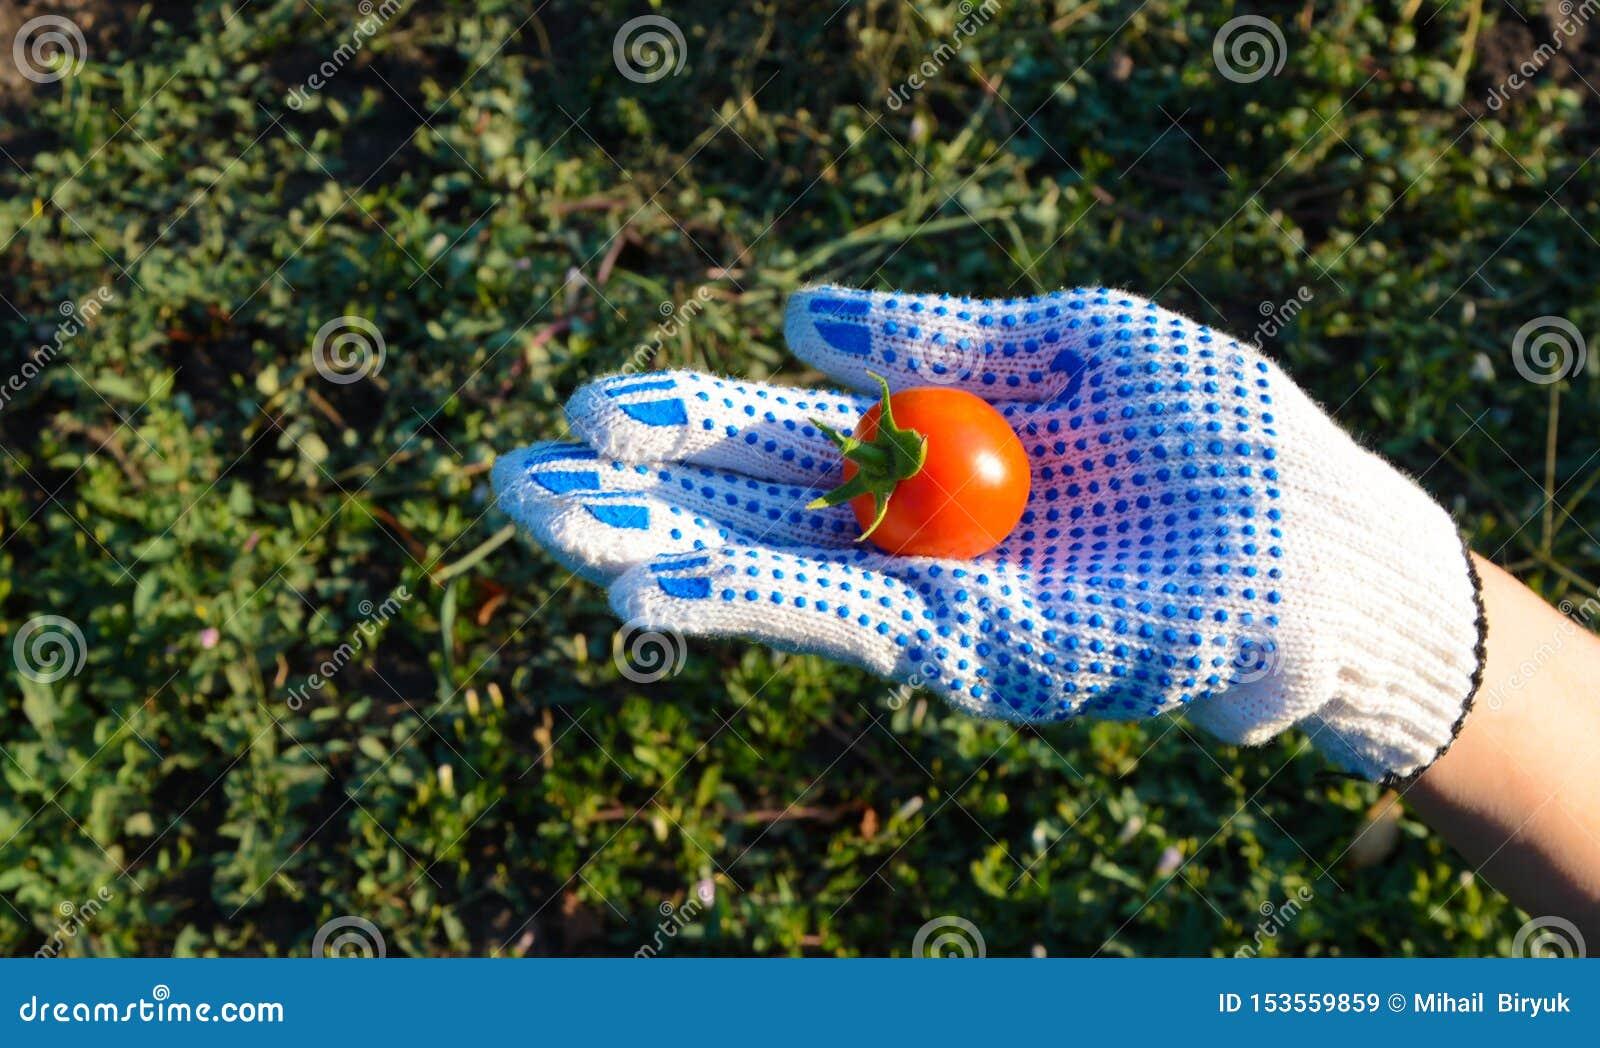 Vitamin-rika små tomater som plockas precis Mat gr?nsaker, jordbruk